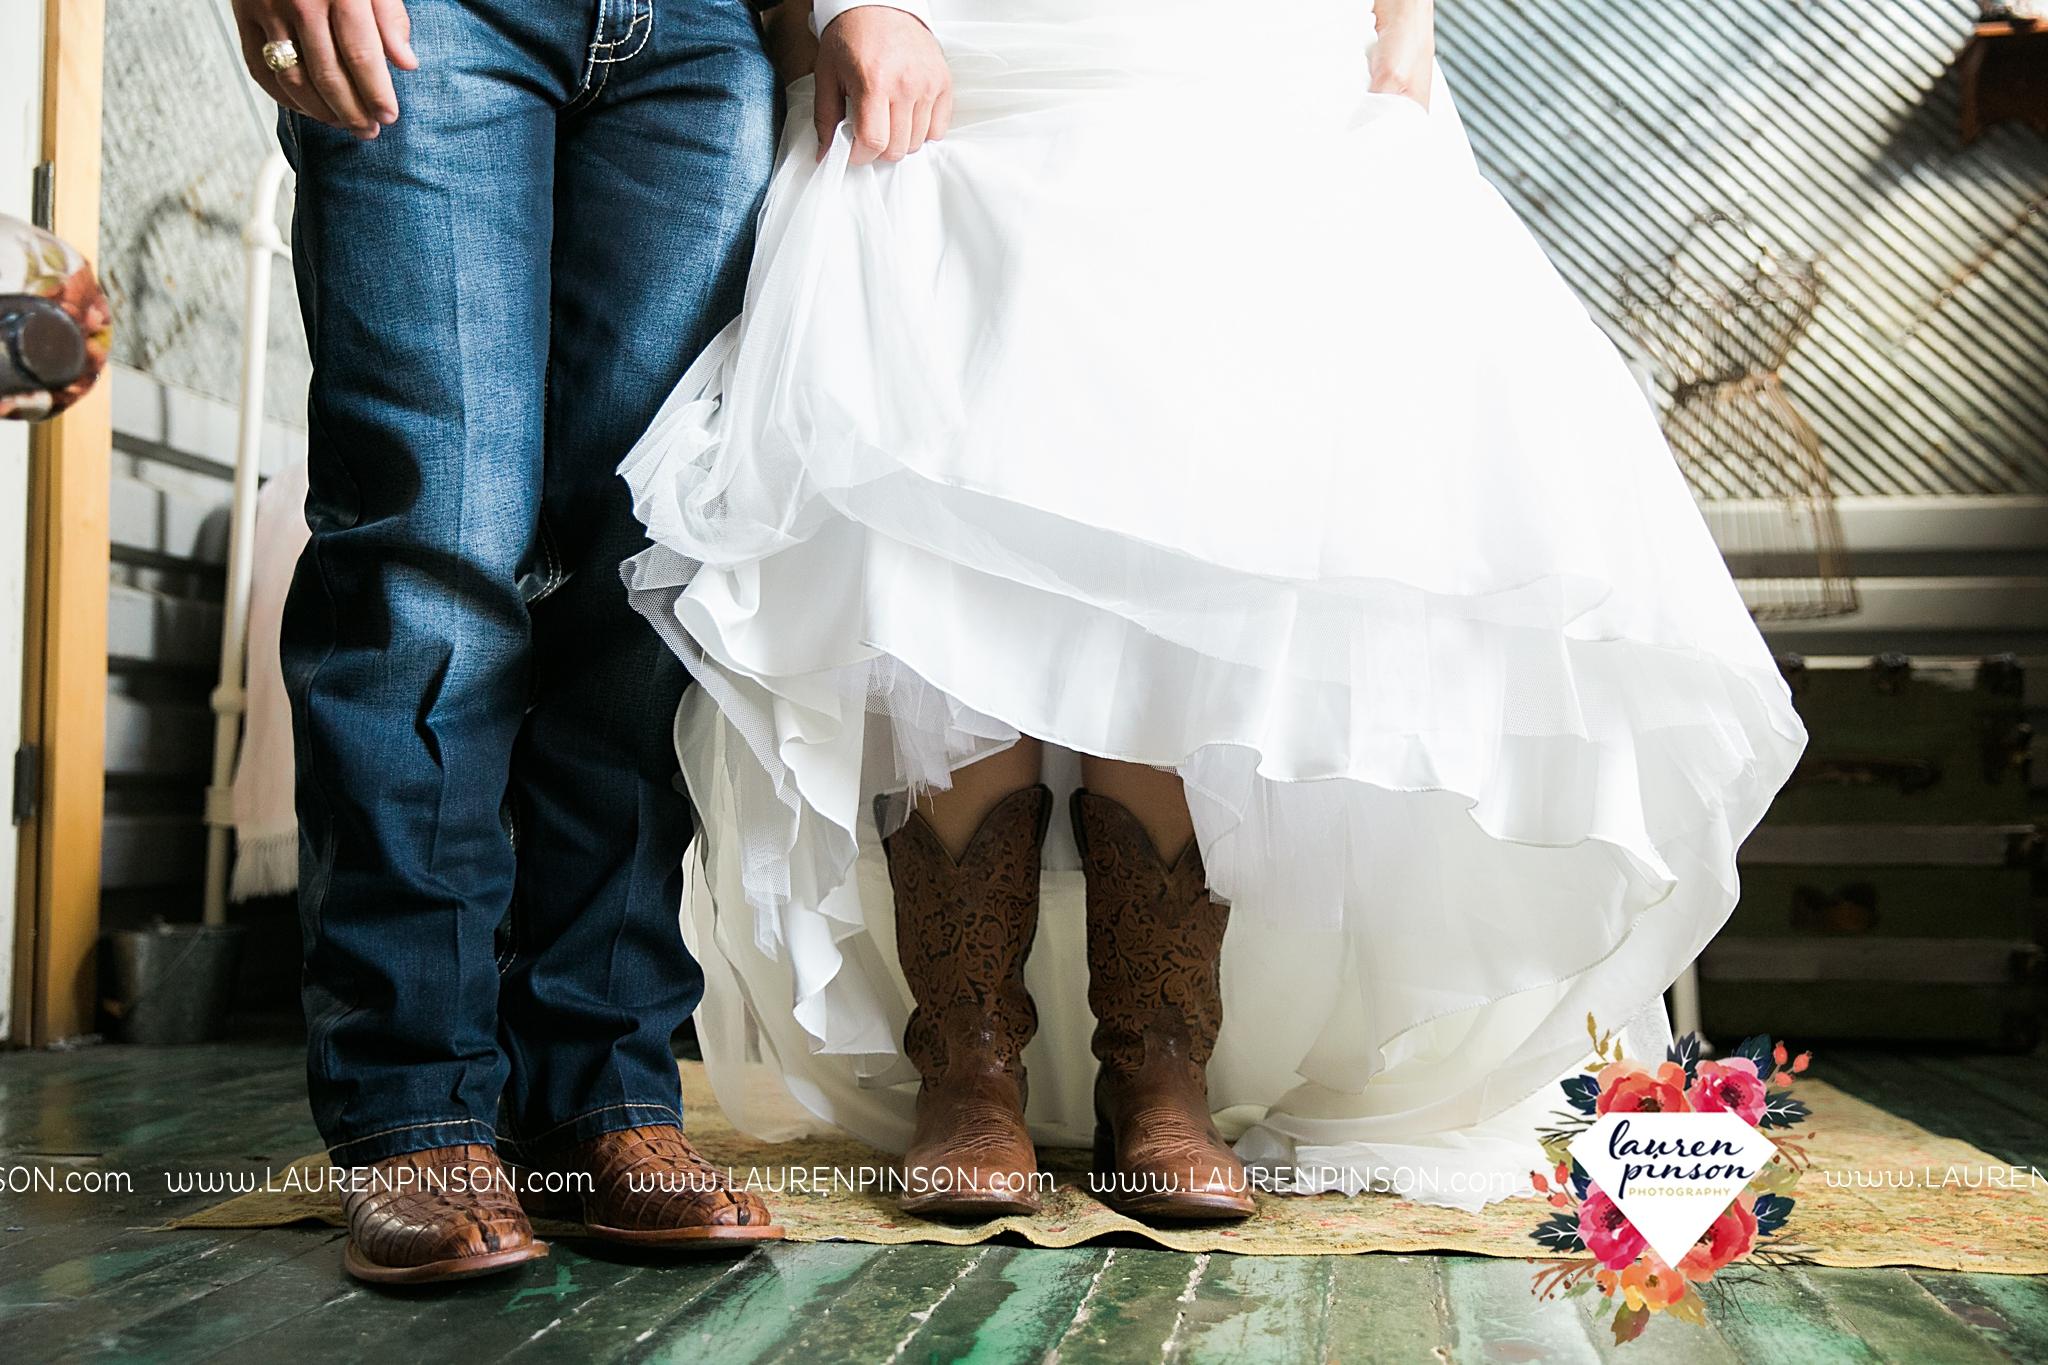 jones-barn-willow-creek-ranch-wedding-in-cleburne-texas-fort-worth-dfw-wichita-falls-wedding-photography_3204.jpg